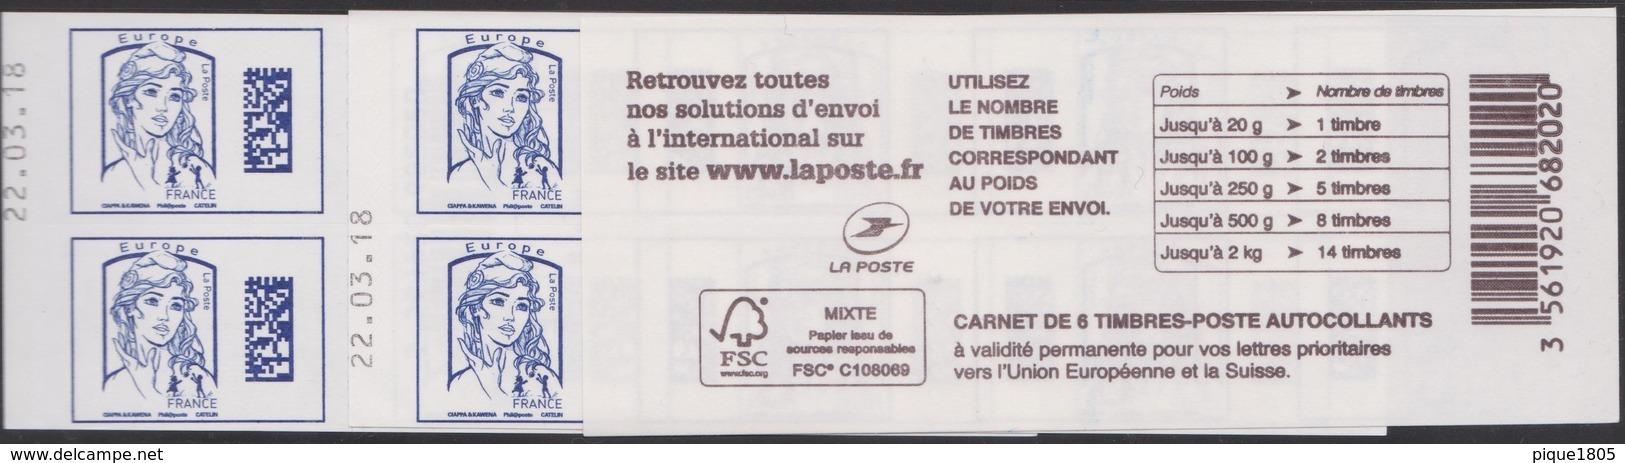 Carnet Europe DataMatrix Marianne Ciappa Daté 22.03.18 - Carnets